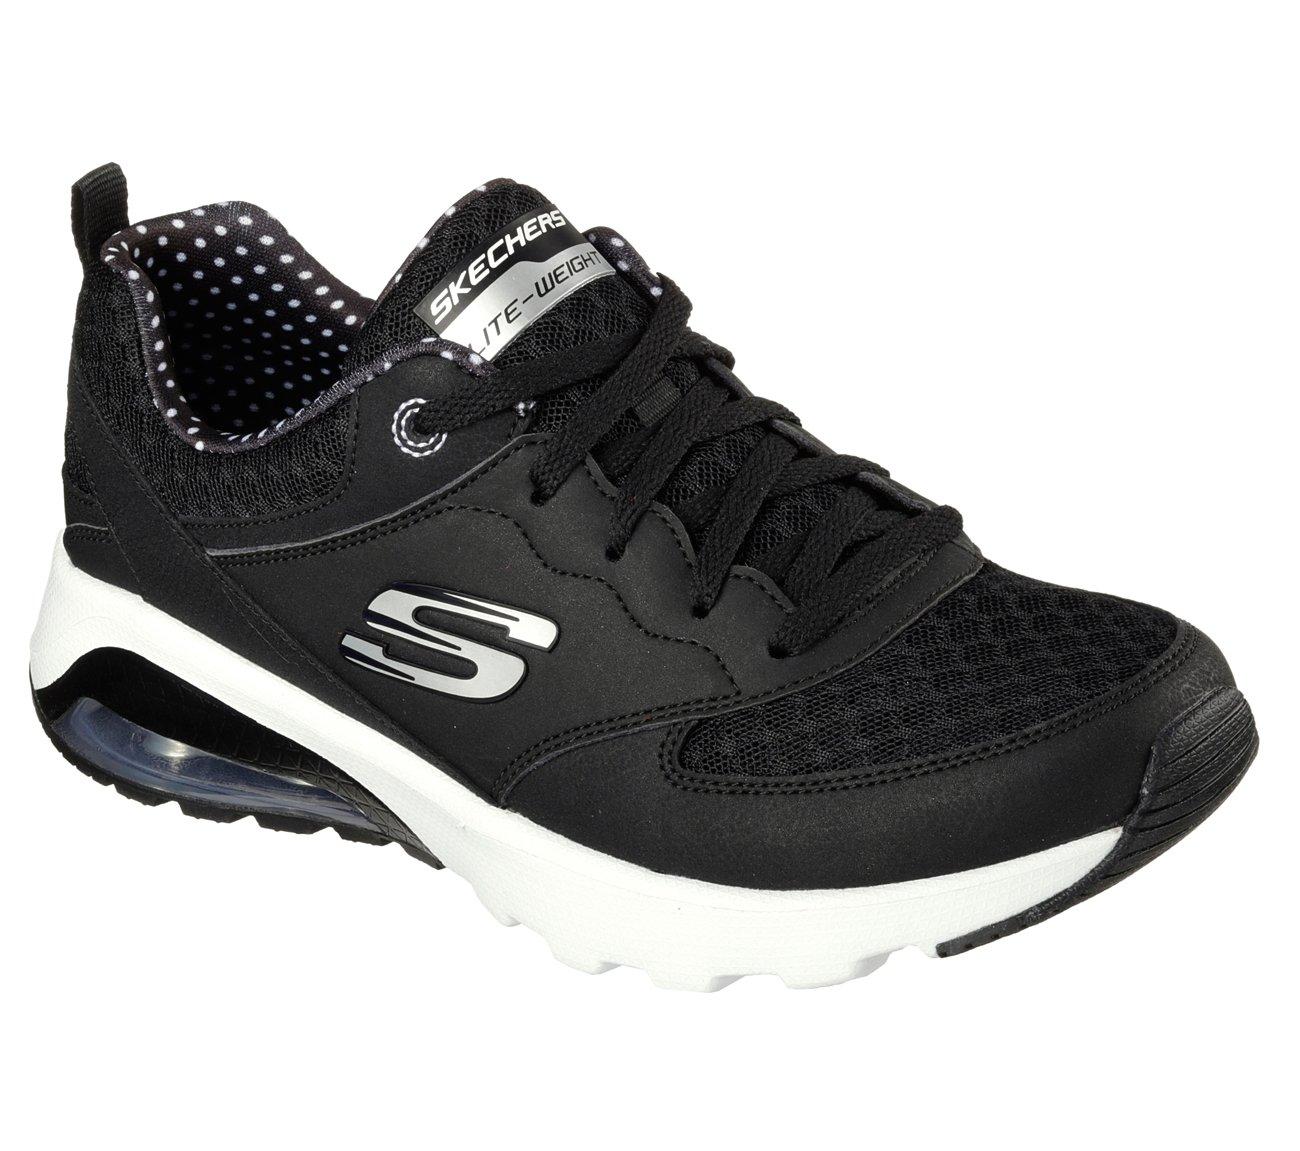 Skechers SKECH AIR EXTREME Women's Trainers Sneaker Air Cooled Memory Foam 38 EU|Bkw